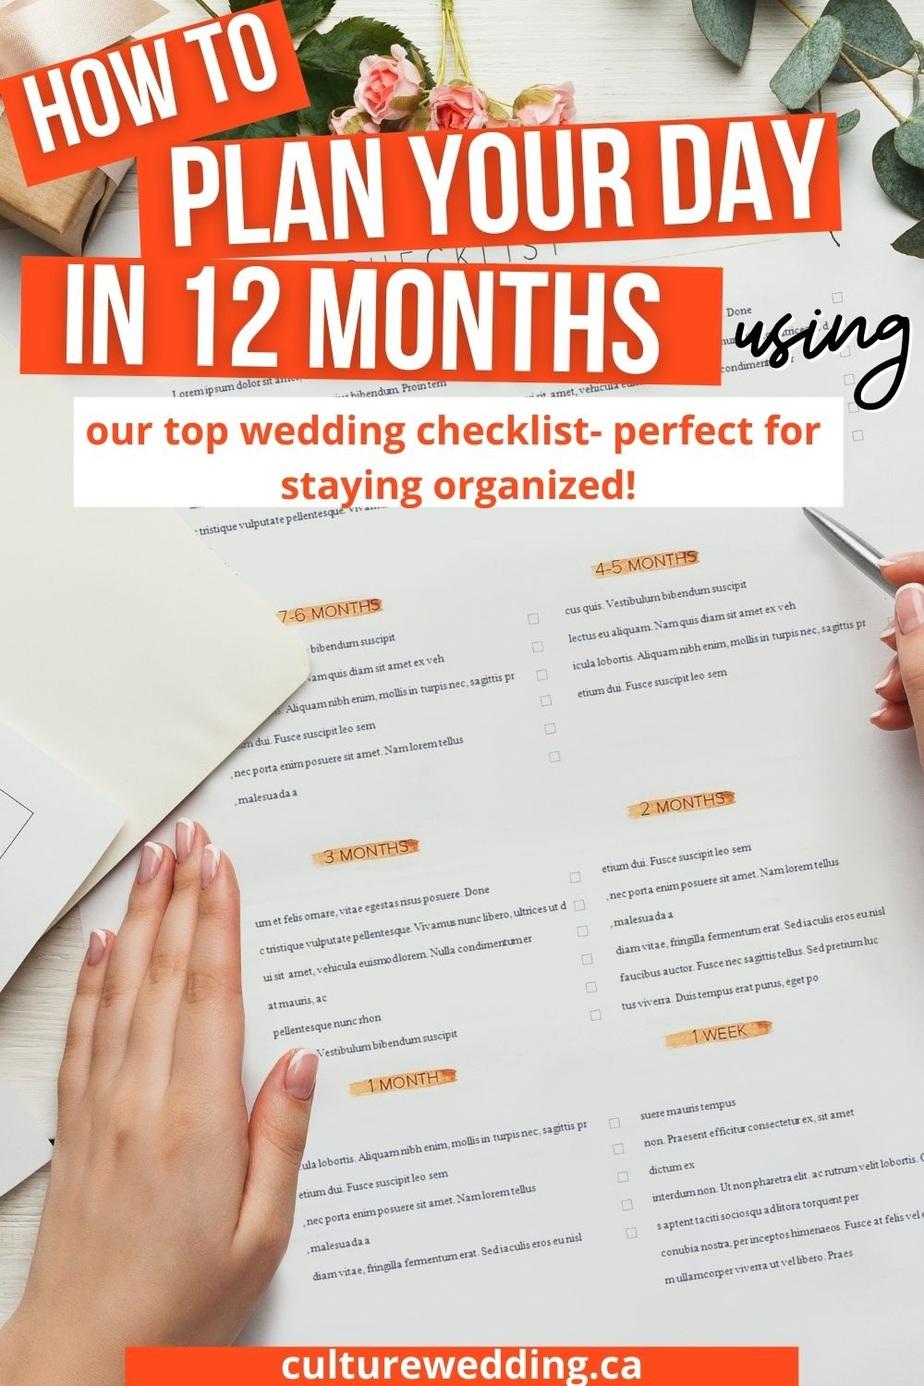 Tips for planning a wedding. 12 month wedding planning checklist.